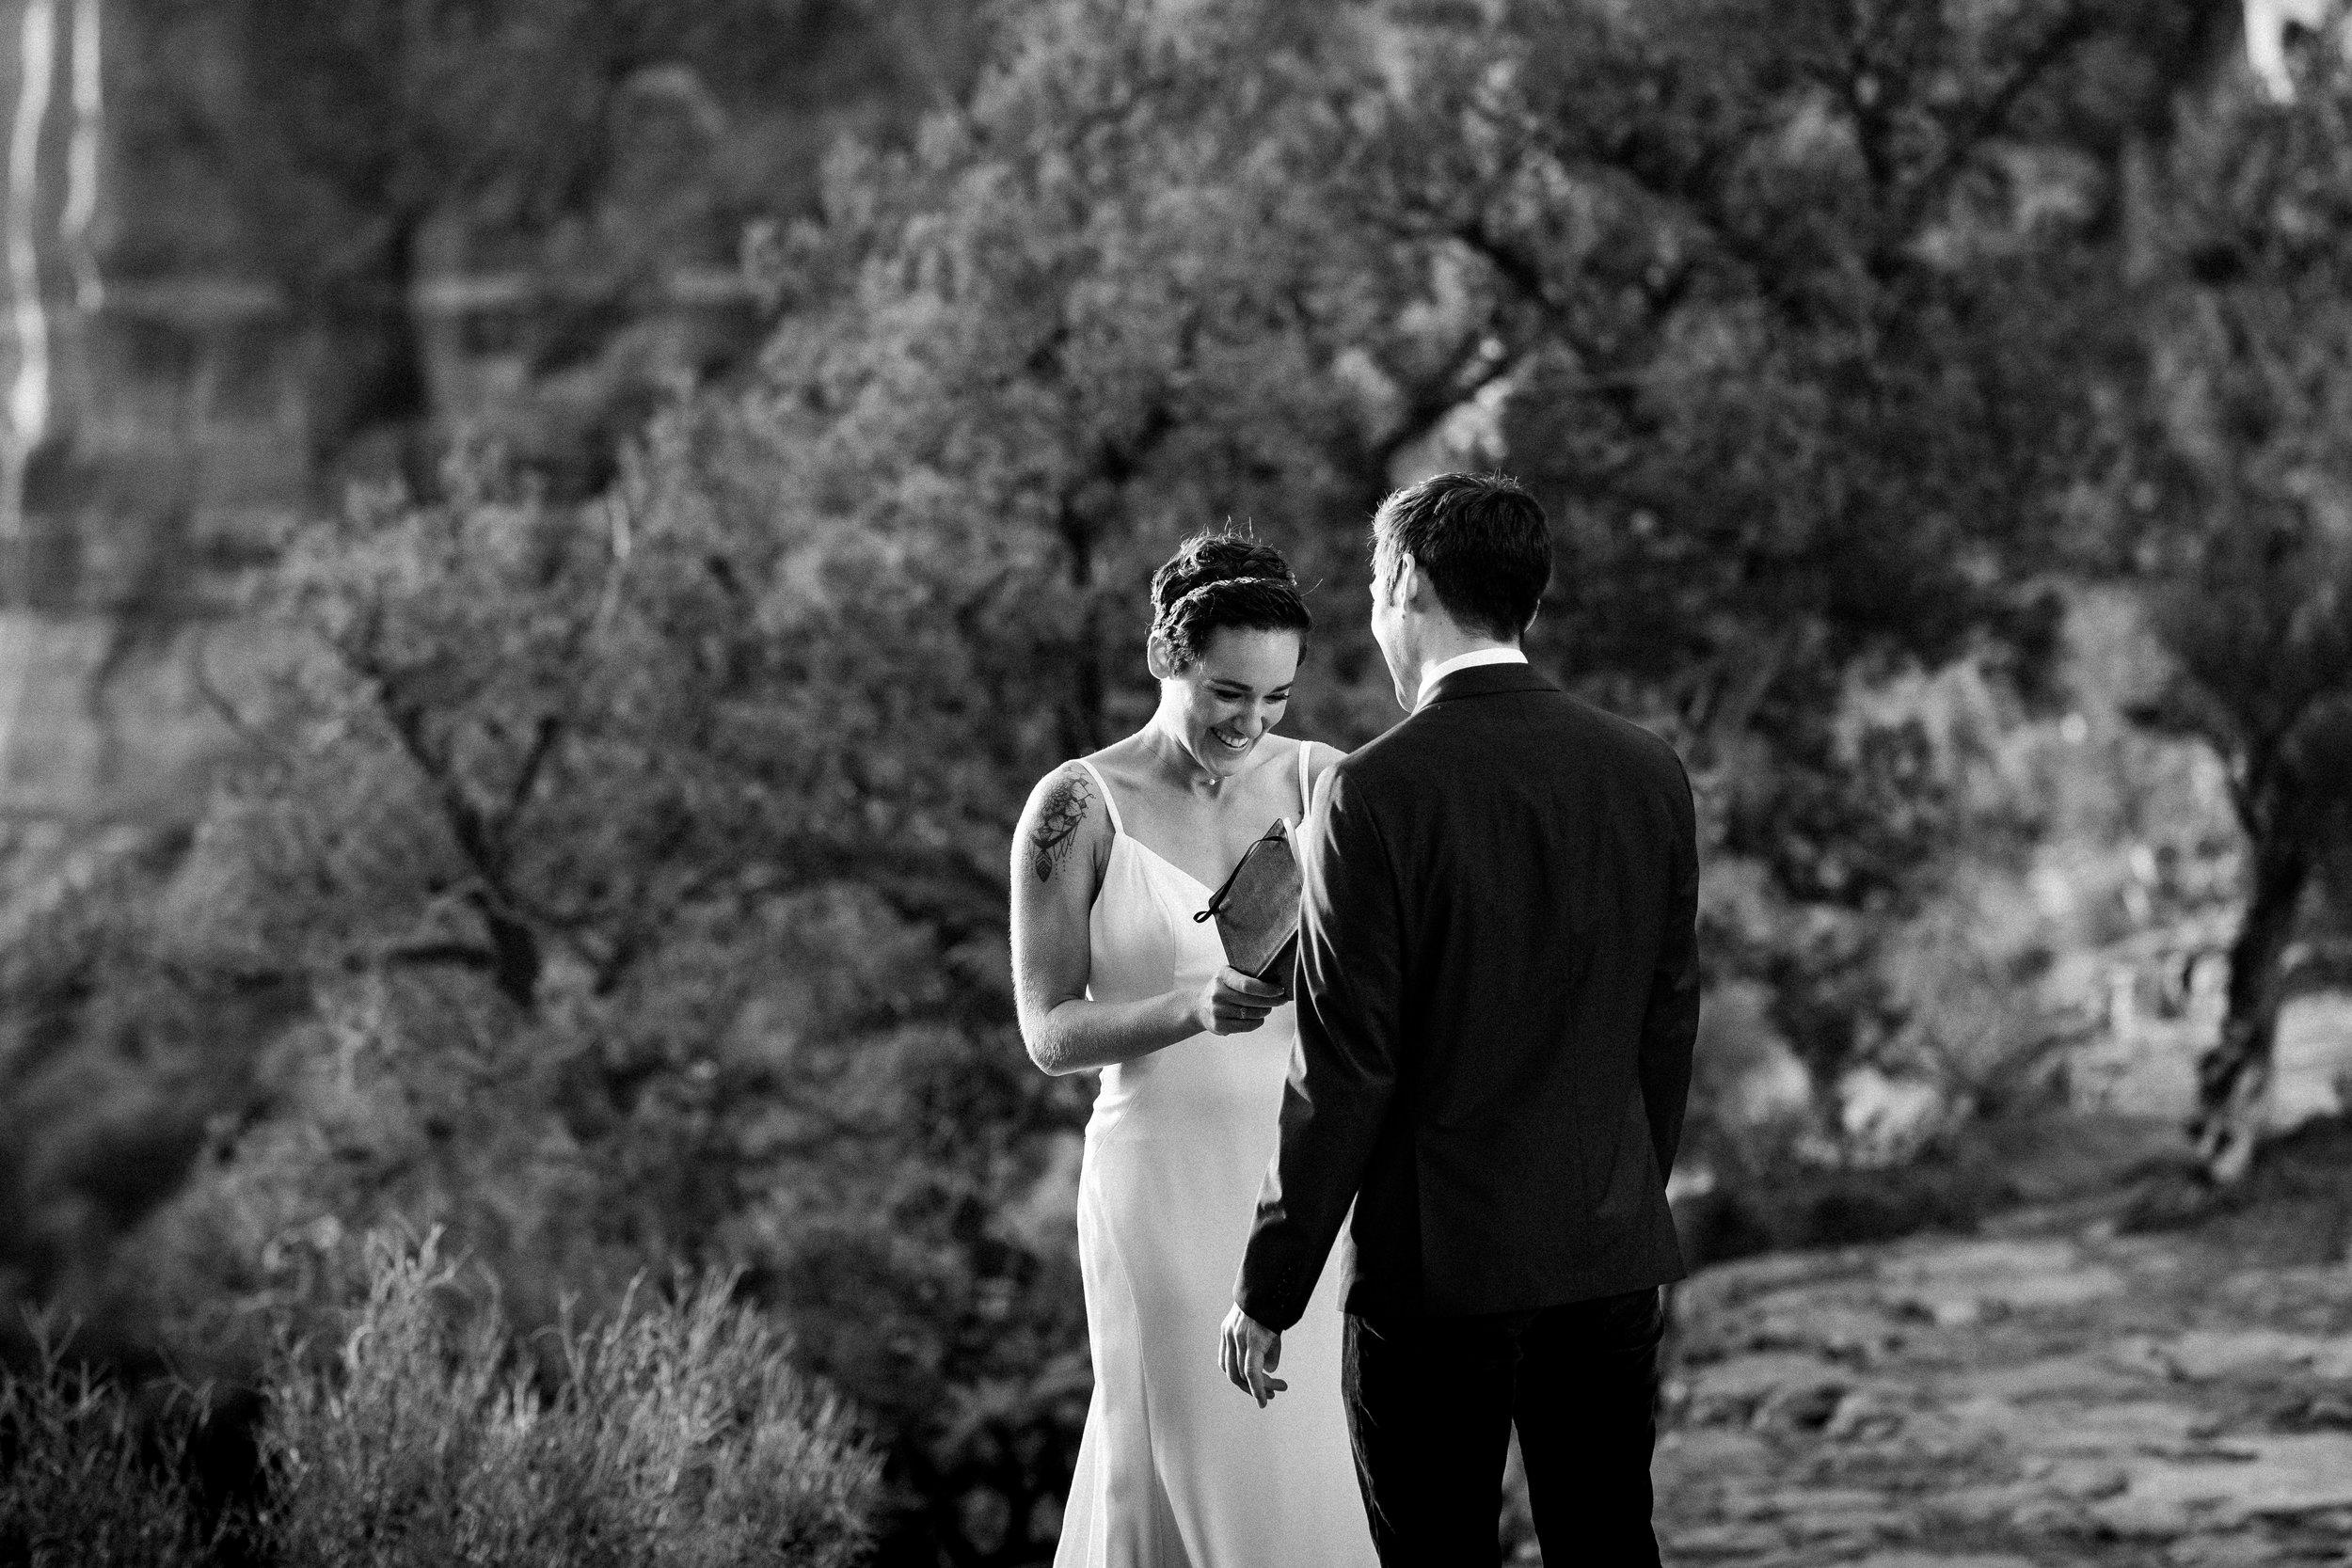 nicole-daacke-photography-sedona-arizona-destination-elopement-wedding-photographer-catherdral-rock-hiking-elopement-sedona-river-elopement-photos-desert-rock-wedding-photographer-laid-back-spontaneous-elopement-41.jpg